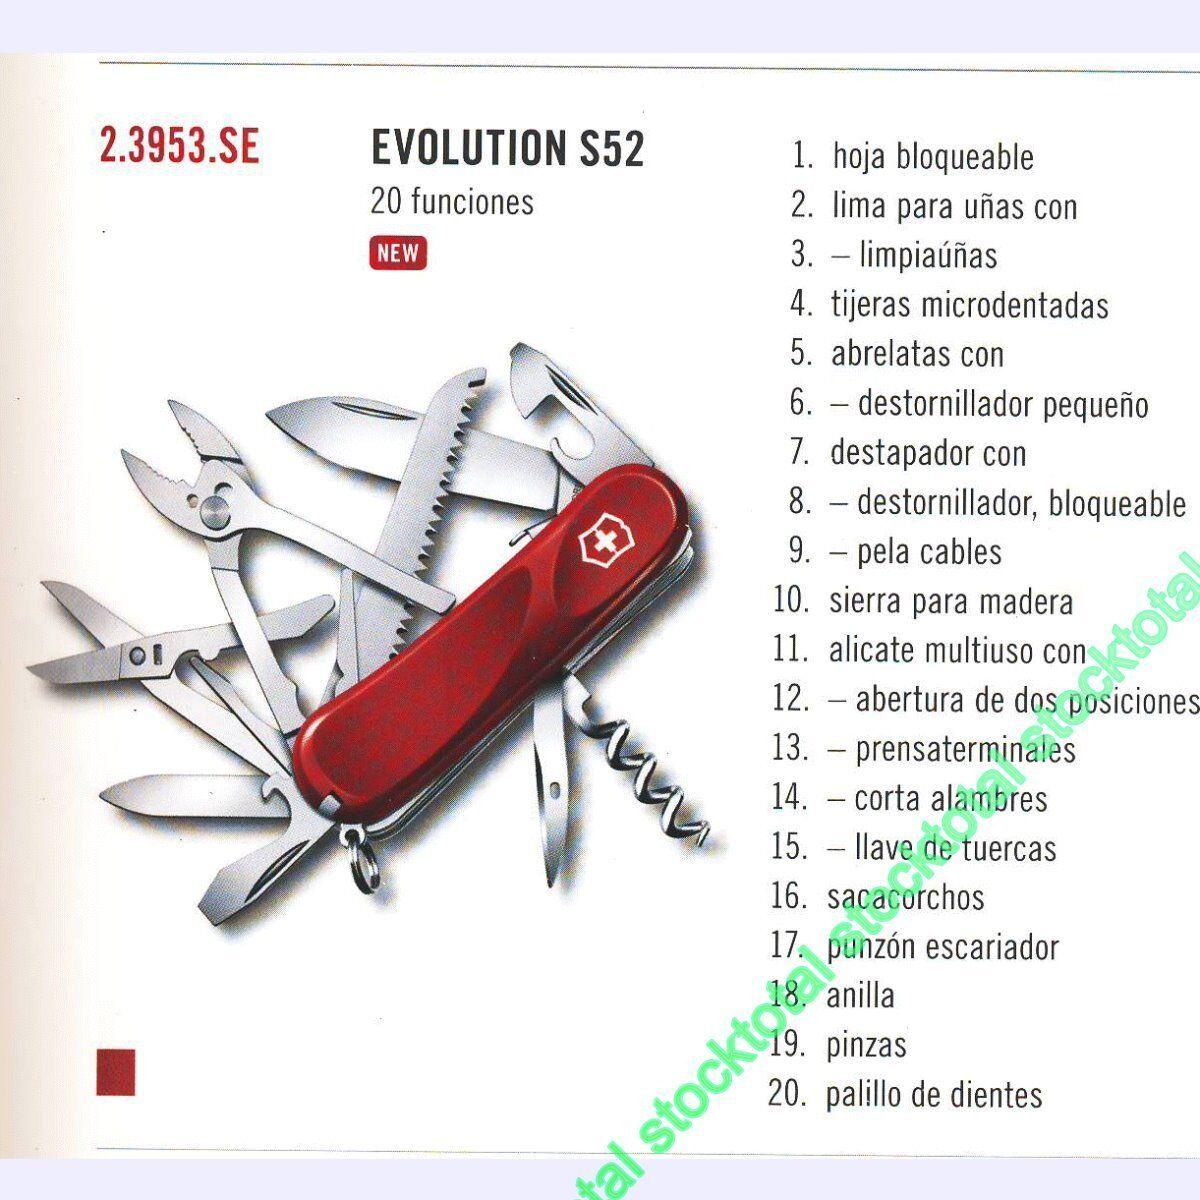 NAVAJA VICTORINOX EVOLUTION S52  23953SE 20 FUNCIONES